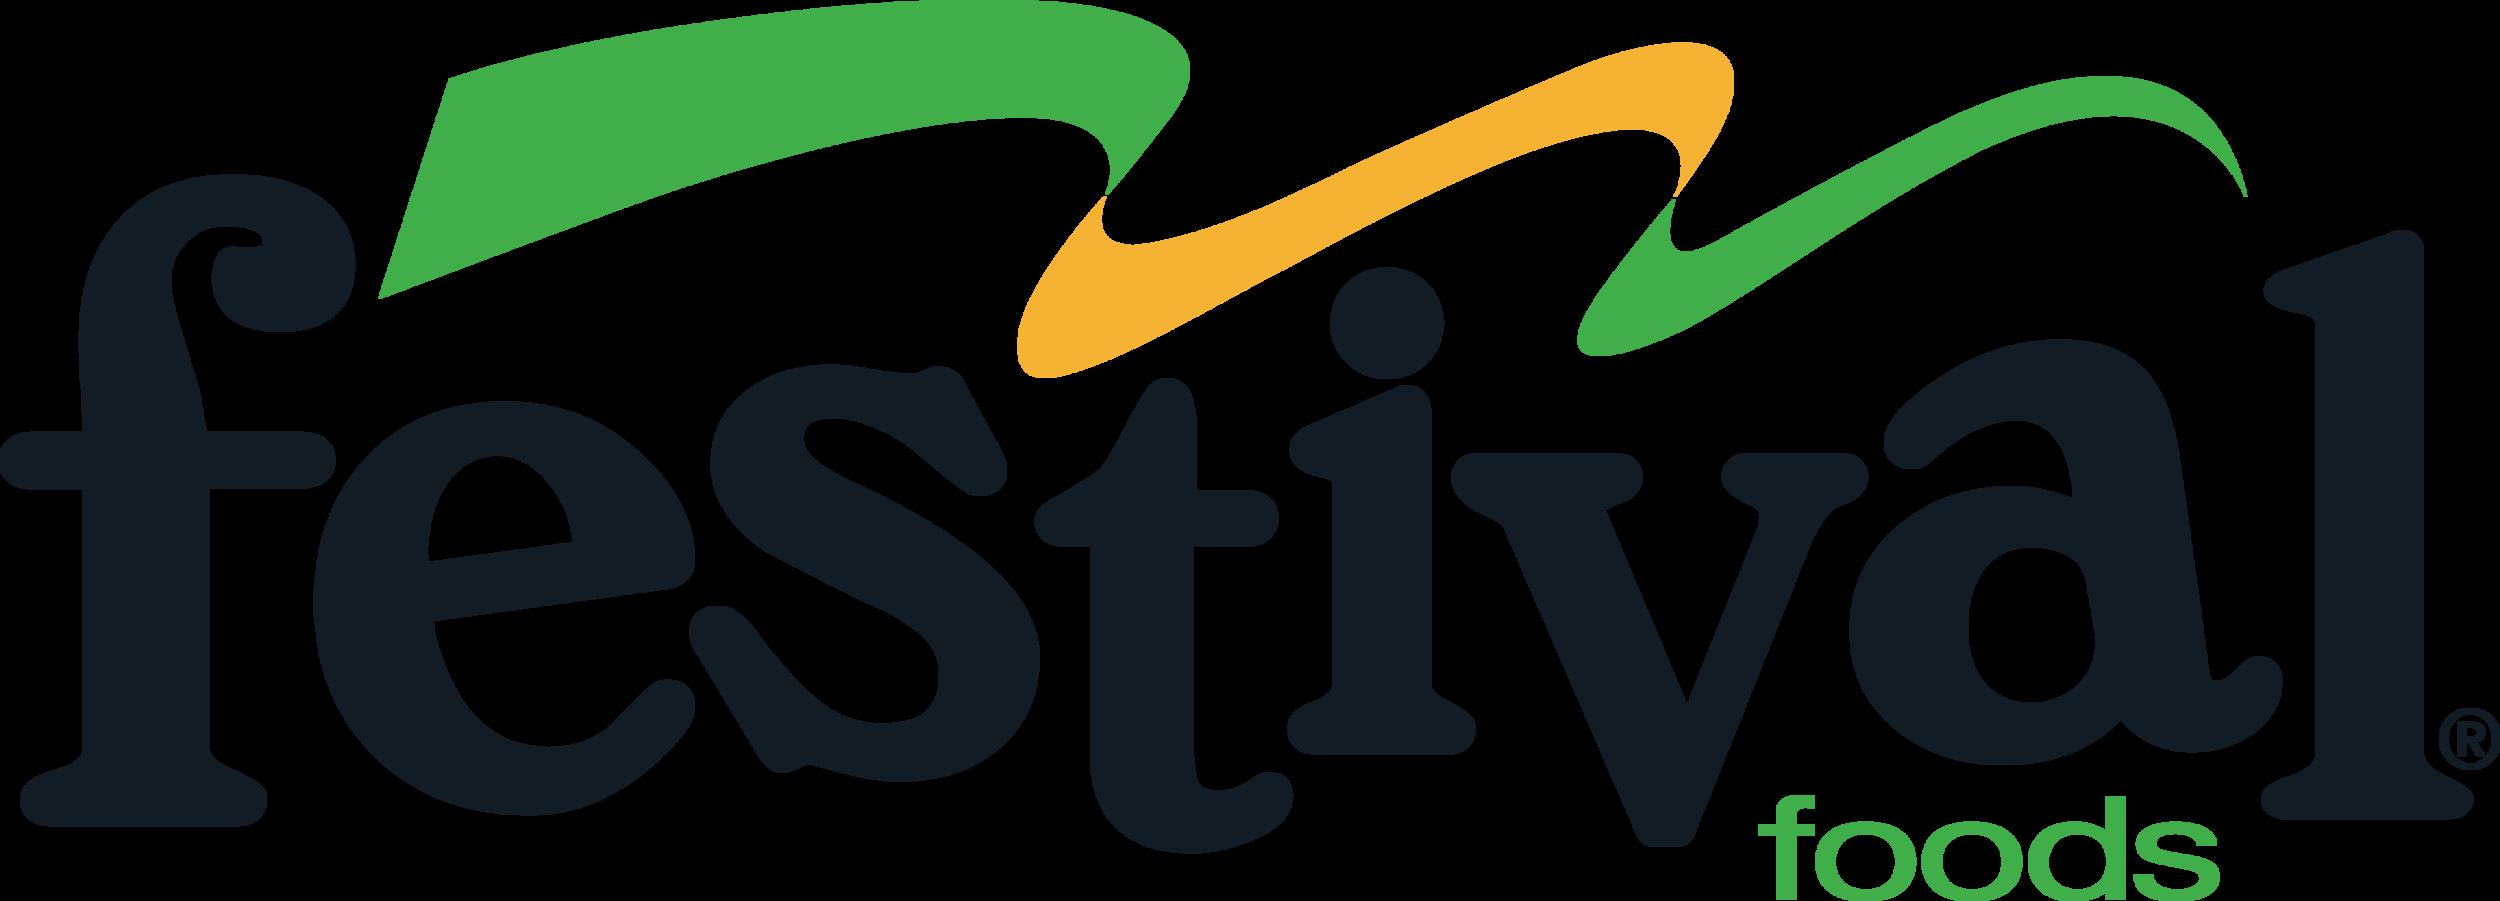 festival color logo.png